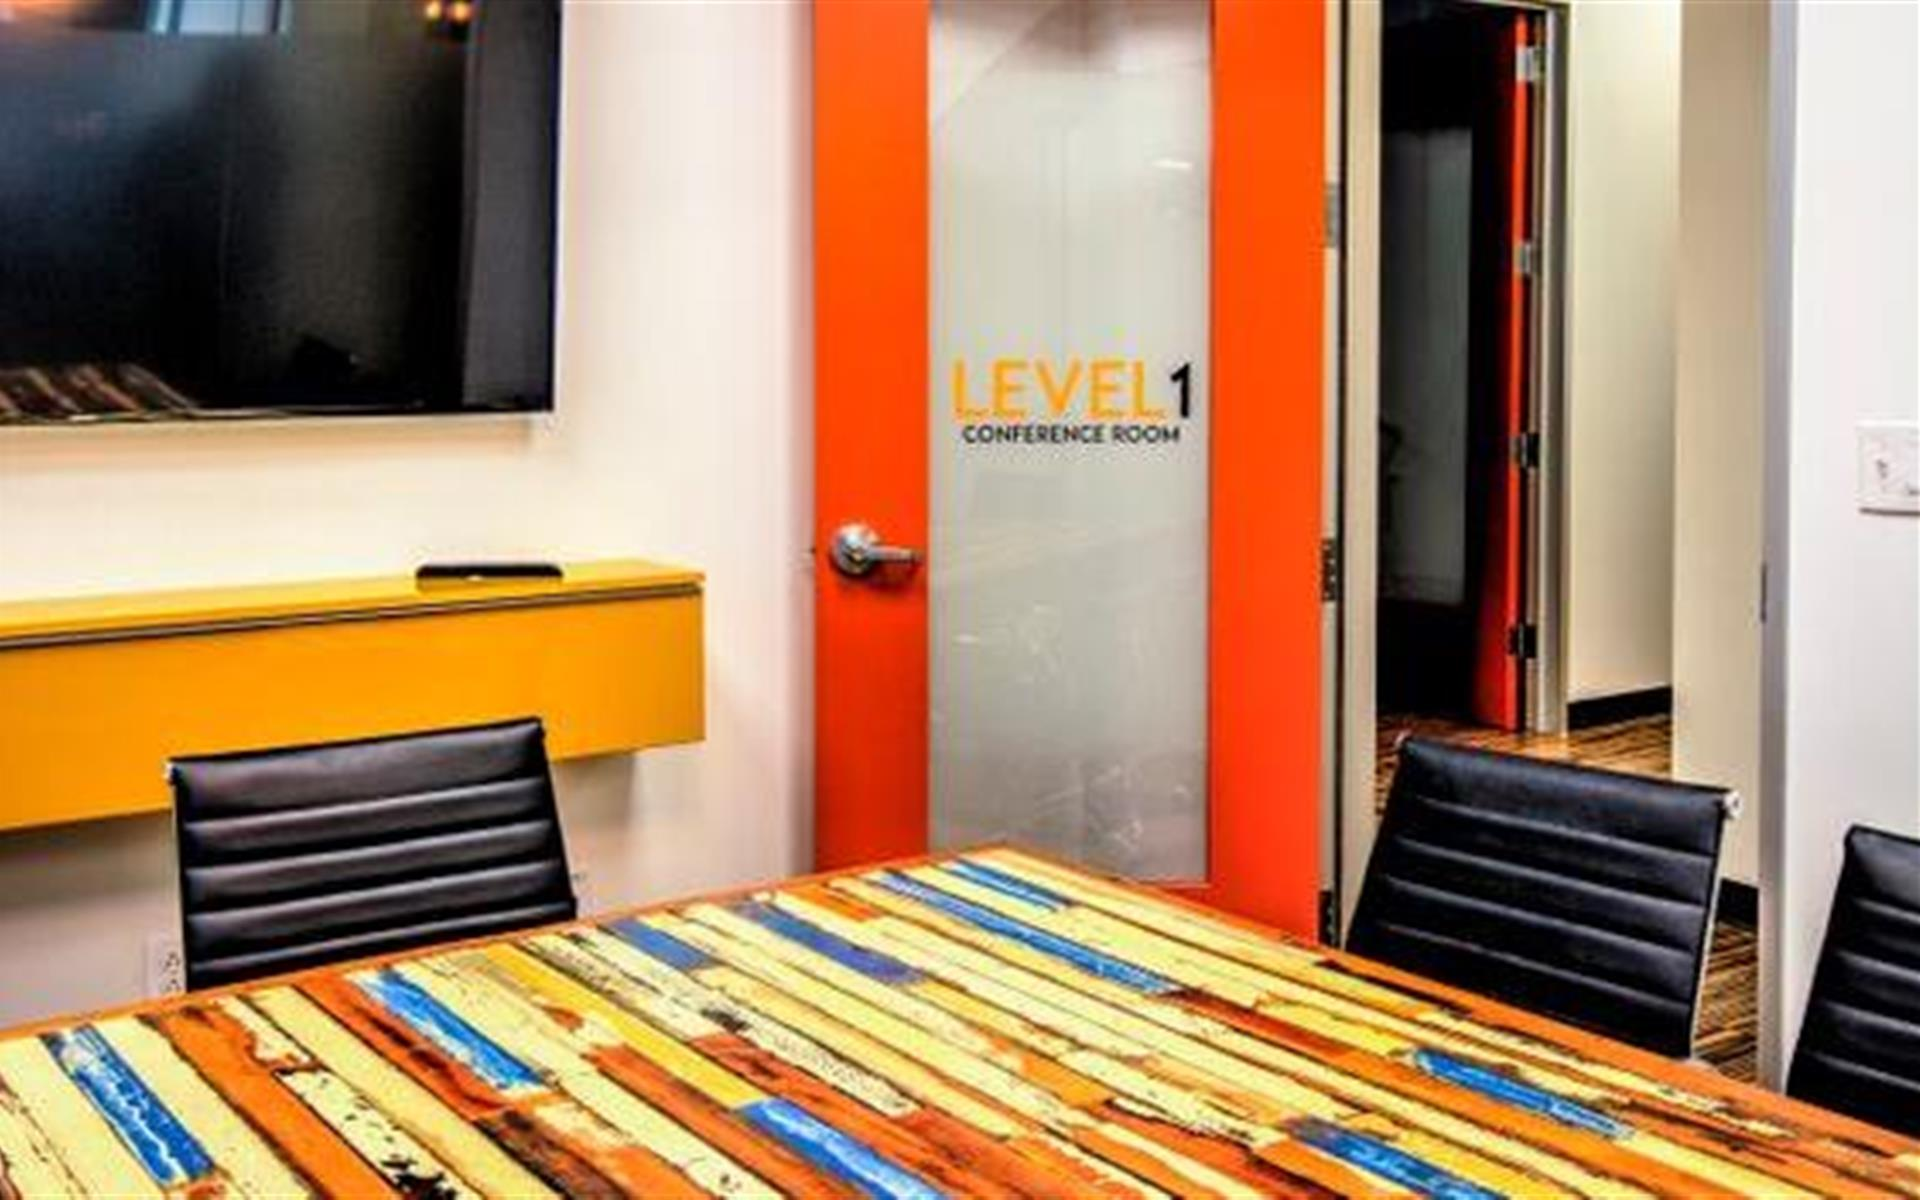 Level Office Charlotte - Conference Room- 1st Floor